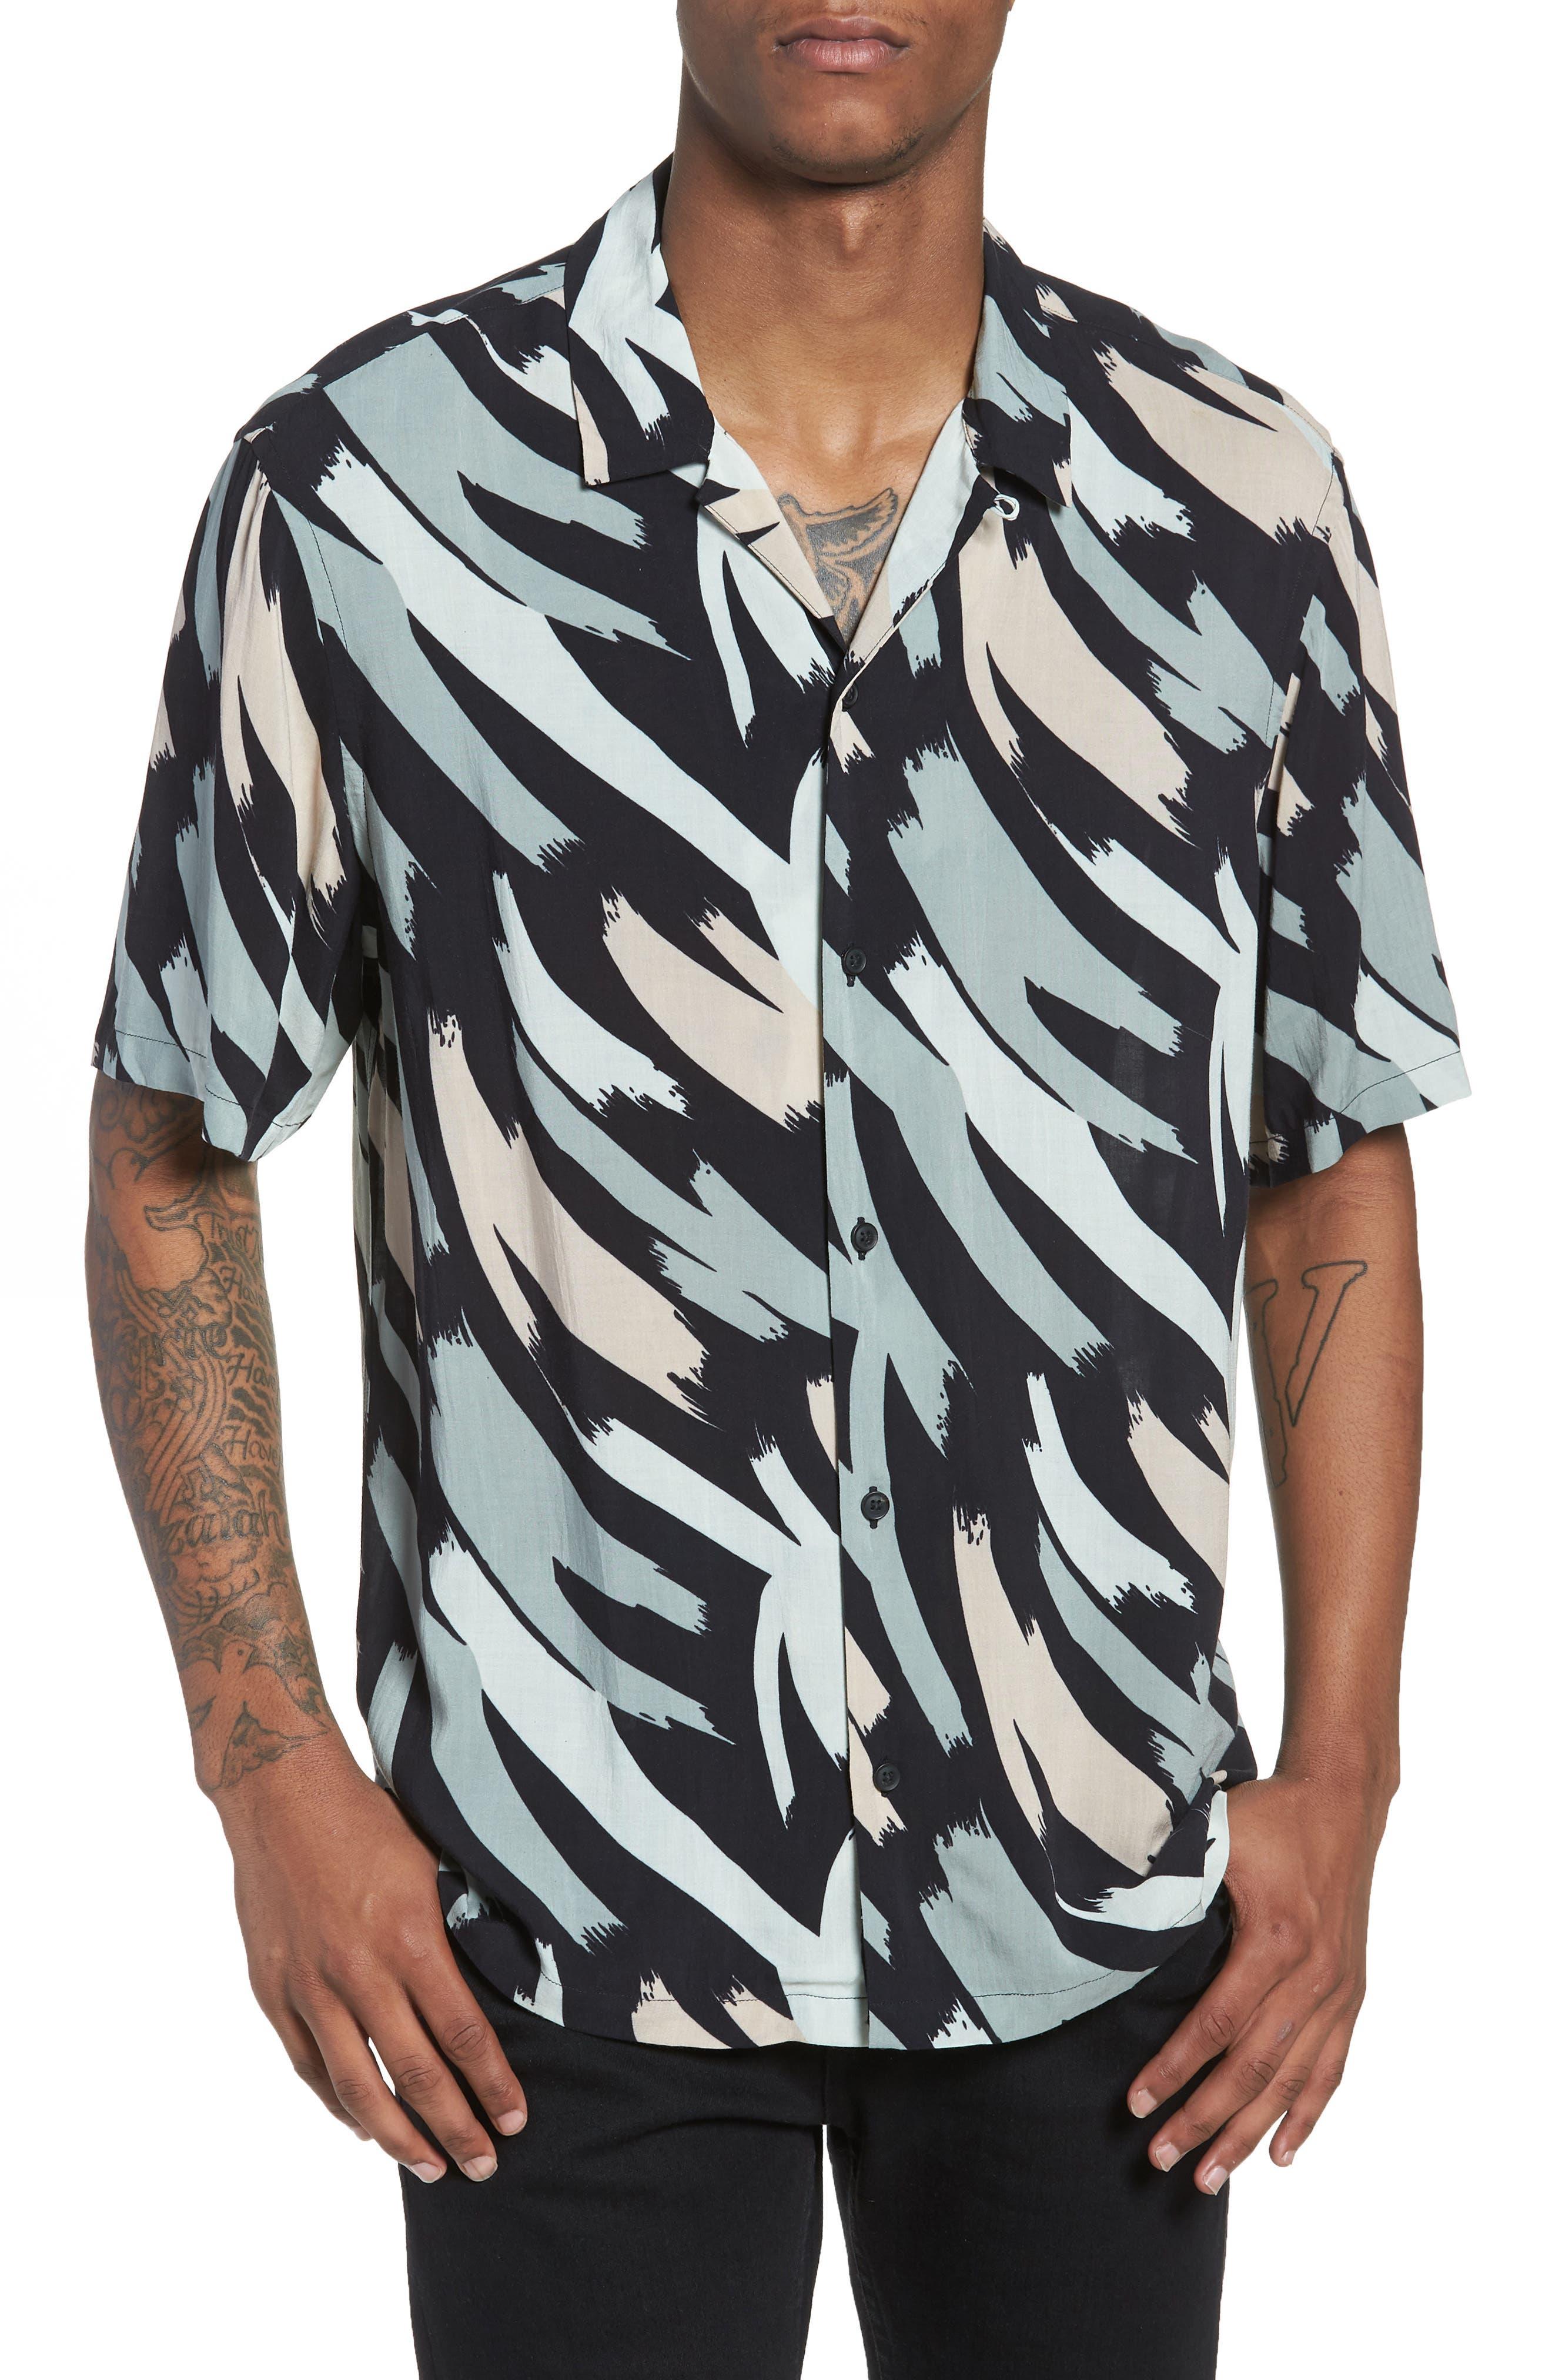 Rope Slim Fit Short Sleeve Sport Shirt,                             Main thumbnail 1, color,                             Black Camo